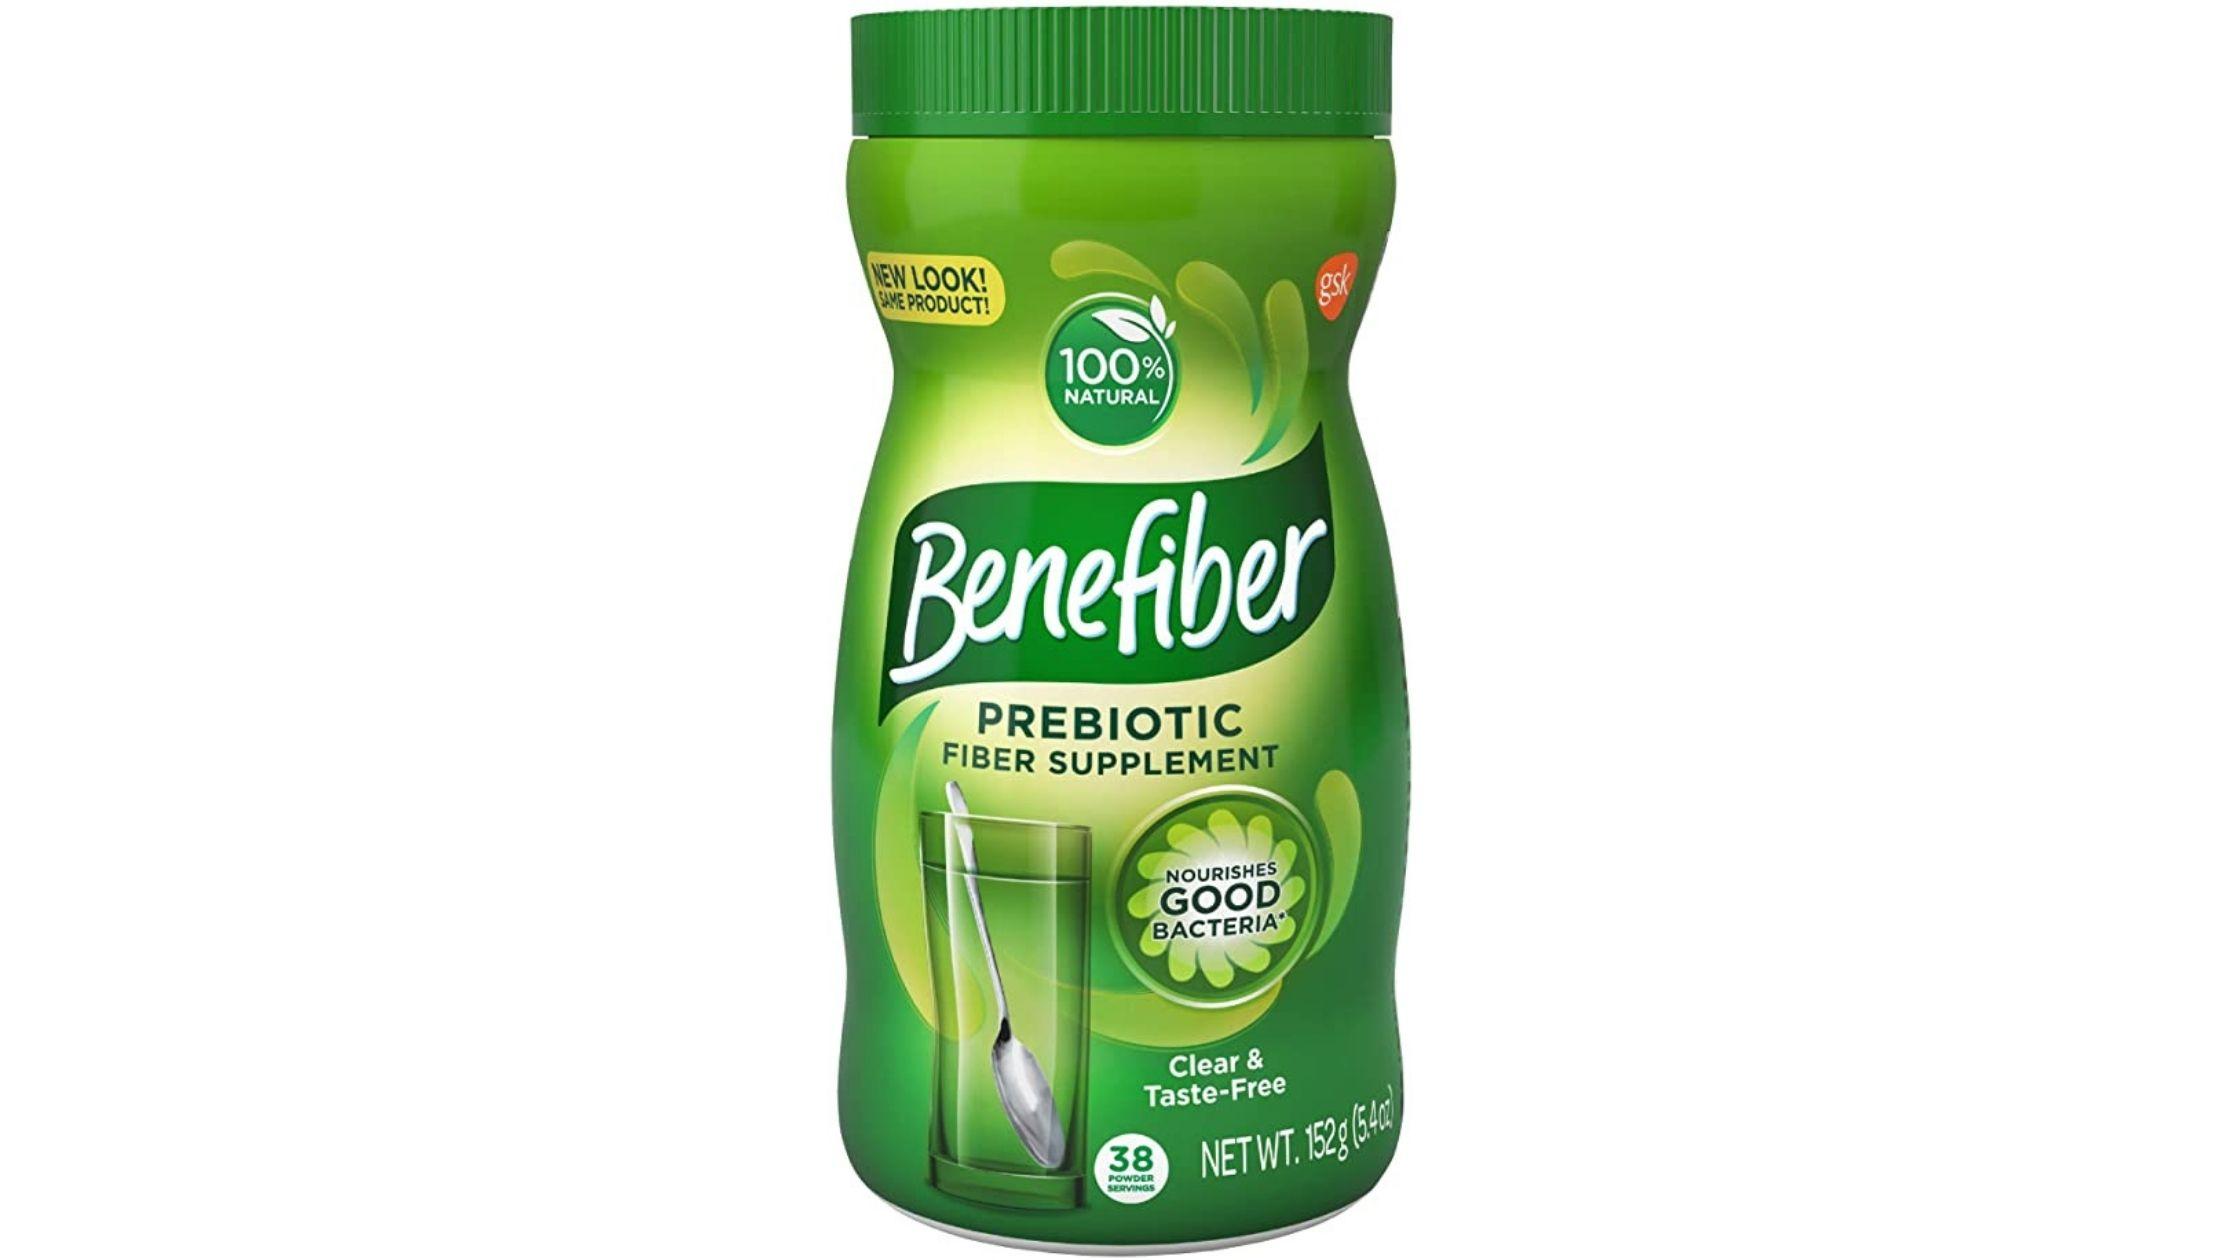 Benefiber Daily Prebiotic dietary fiber